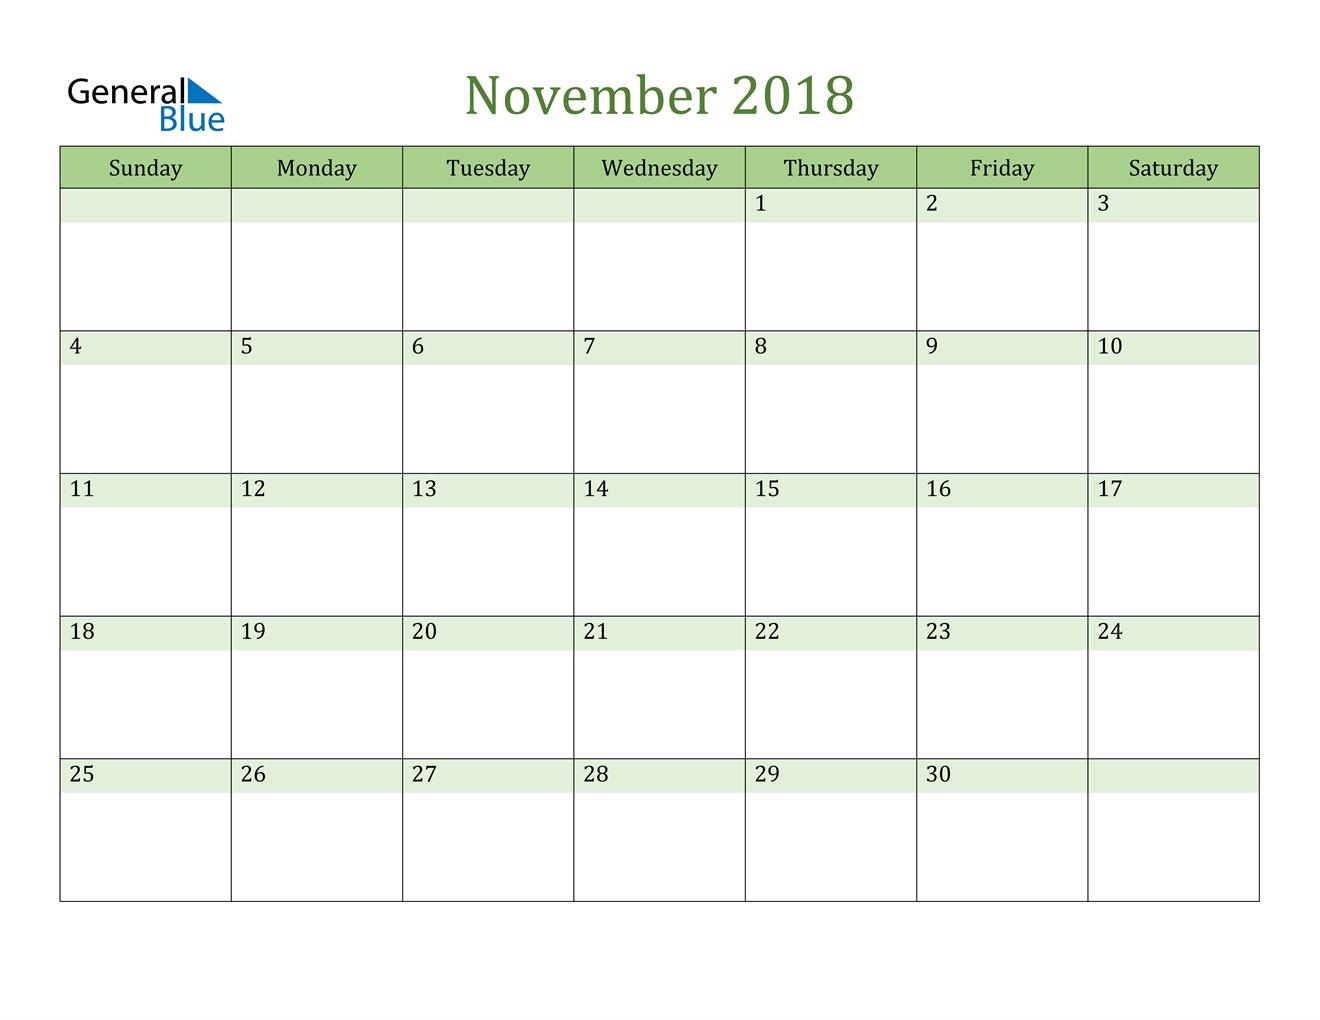 Image of November 2018 Cool and Relaxing Green Calendar Calendar